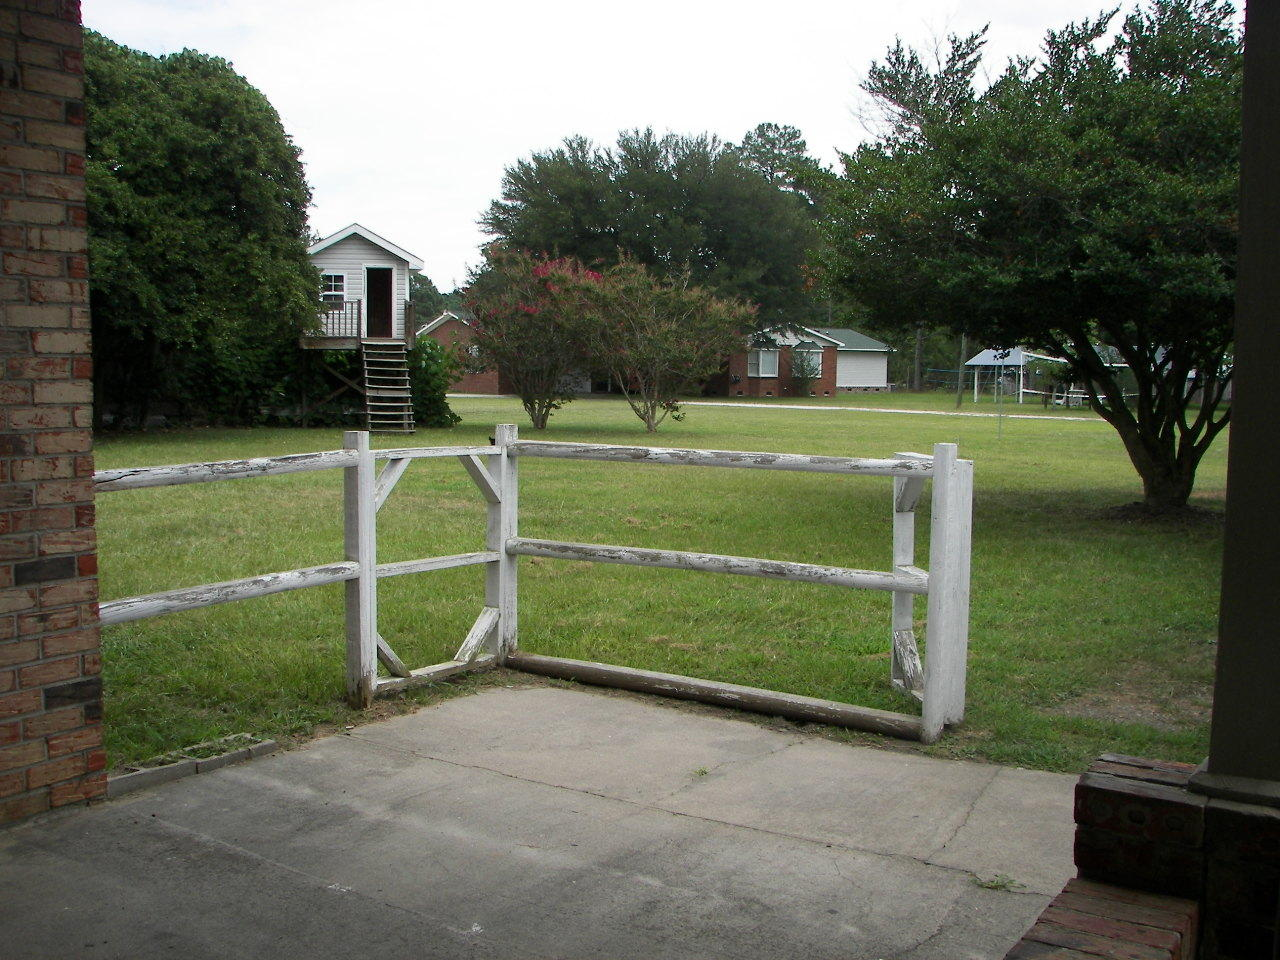 Glendale Acres Homes For Sale - 214 Ruby, Summerville, SC - 4